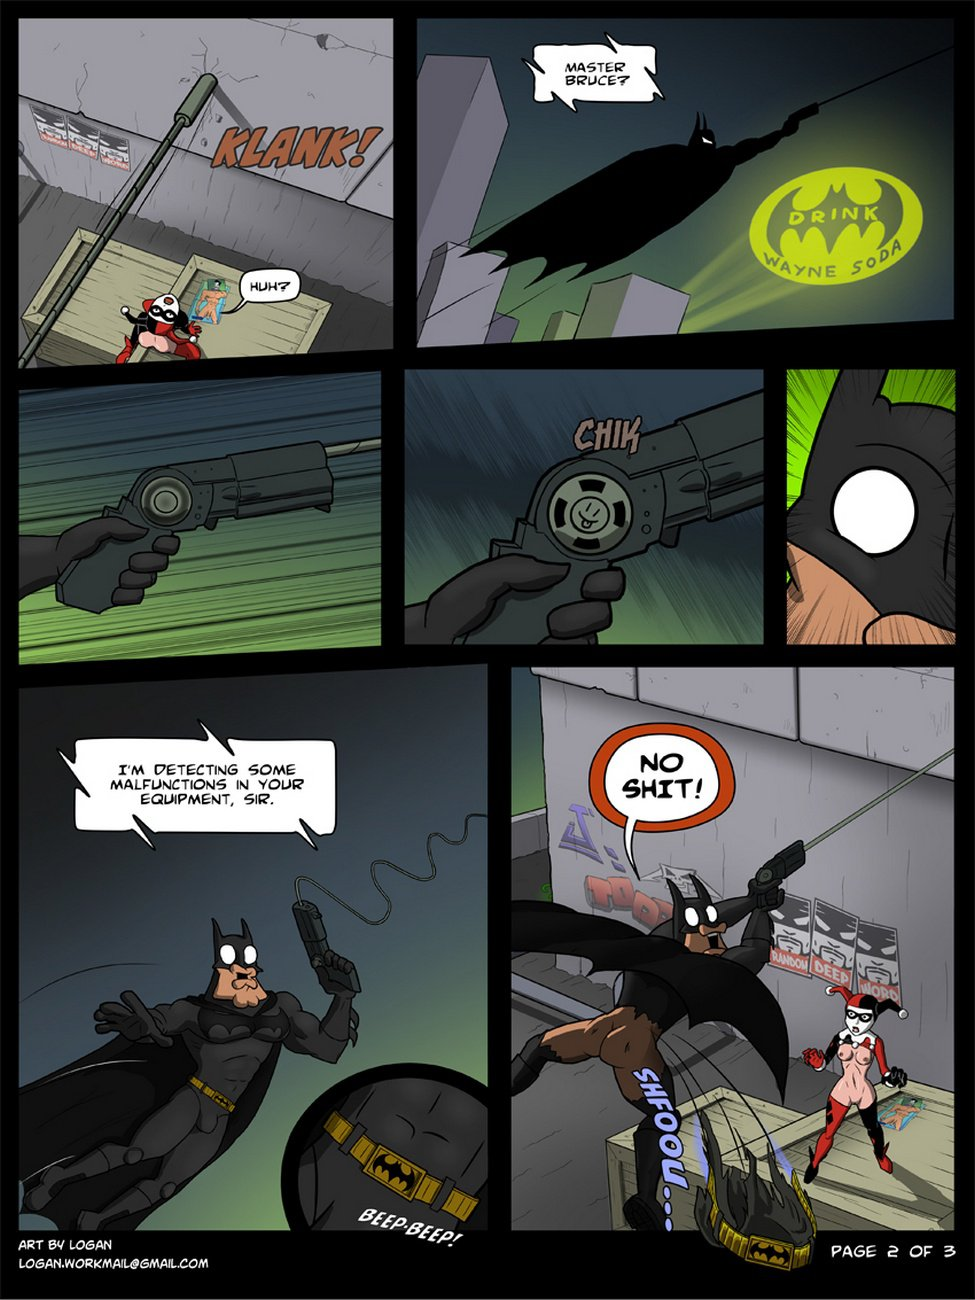 batman batman_(series) batman_the_animated_series bruce_wayne comic harleen_quinzel harley_quinn logan_(artist) nude